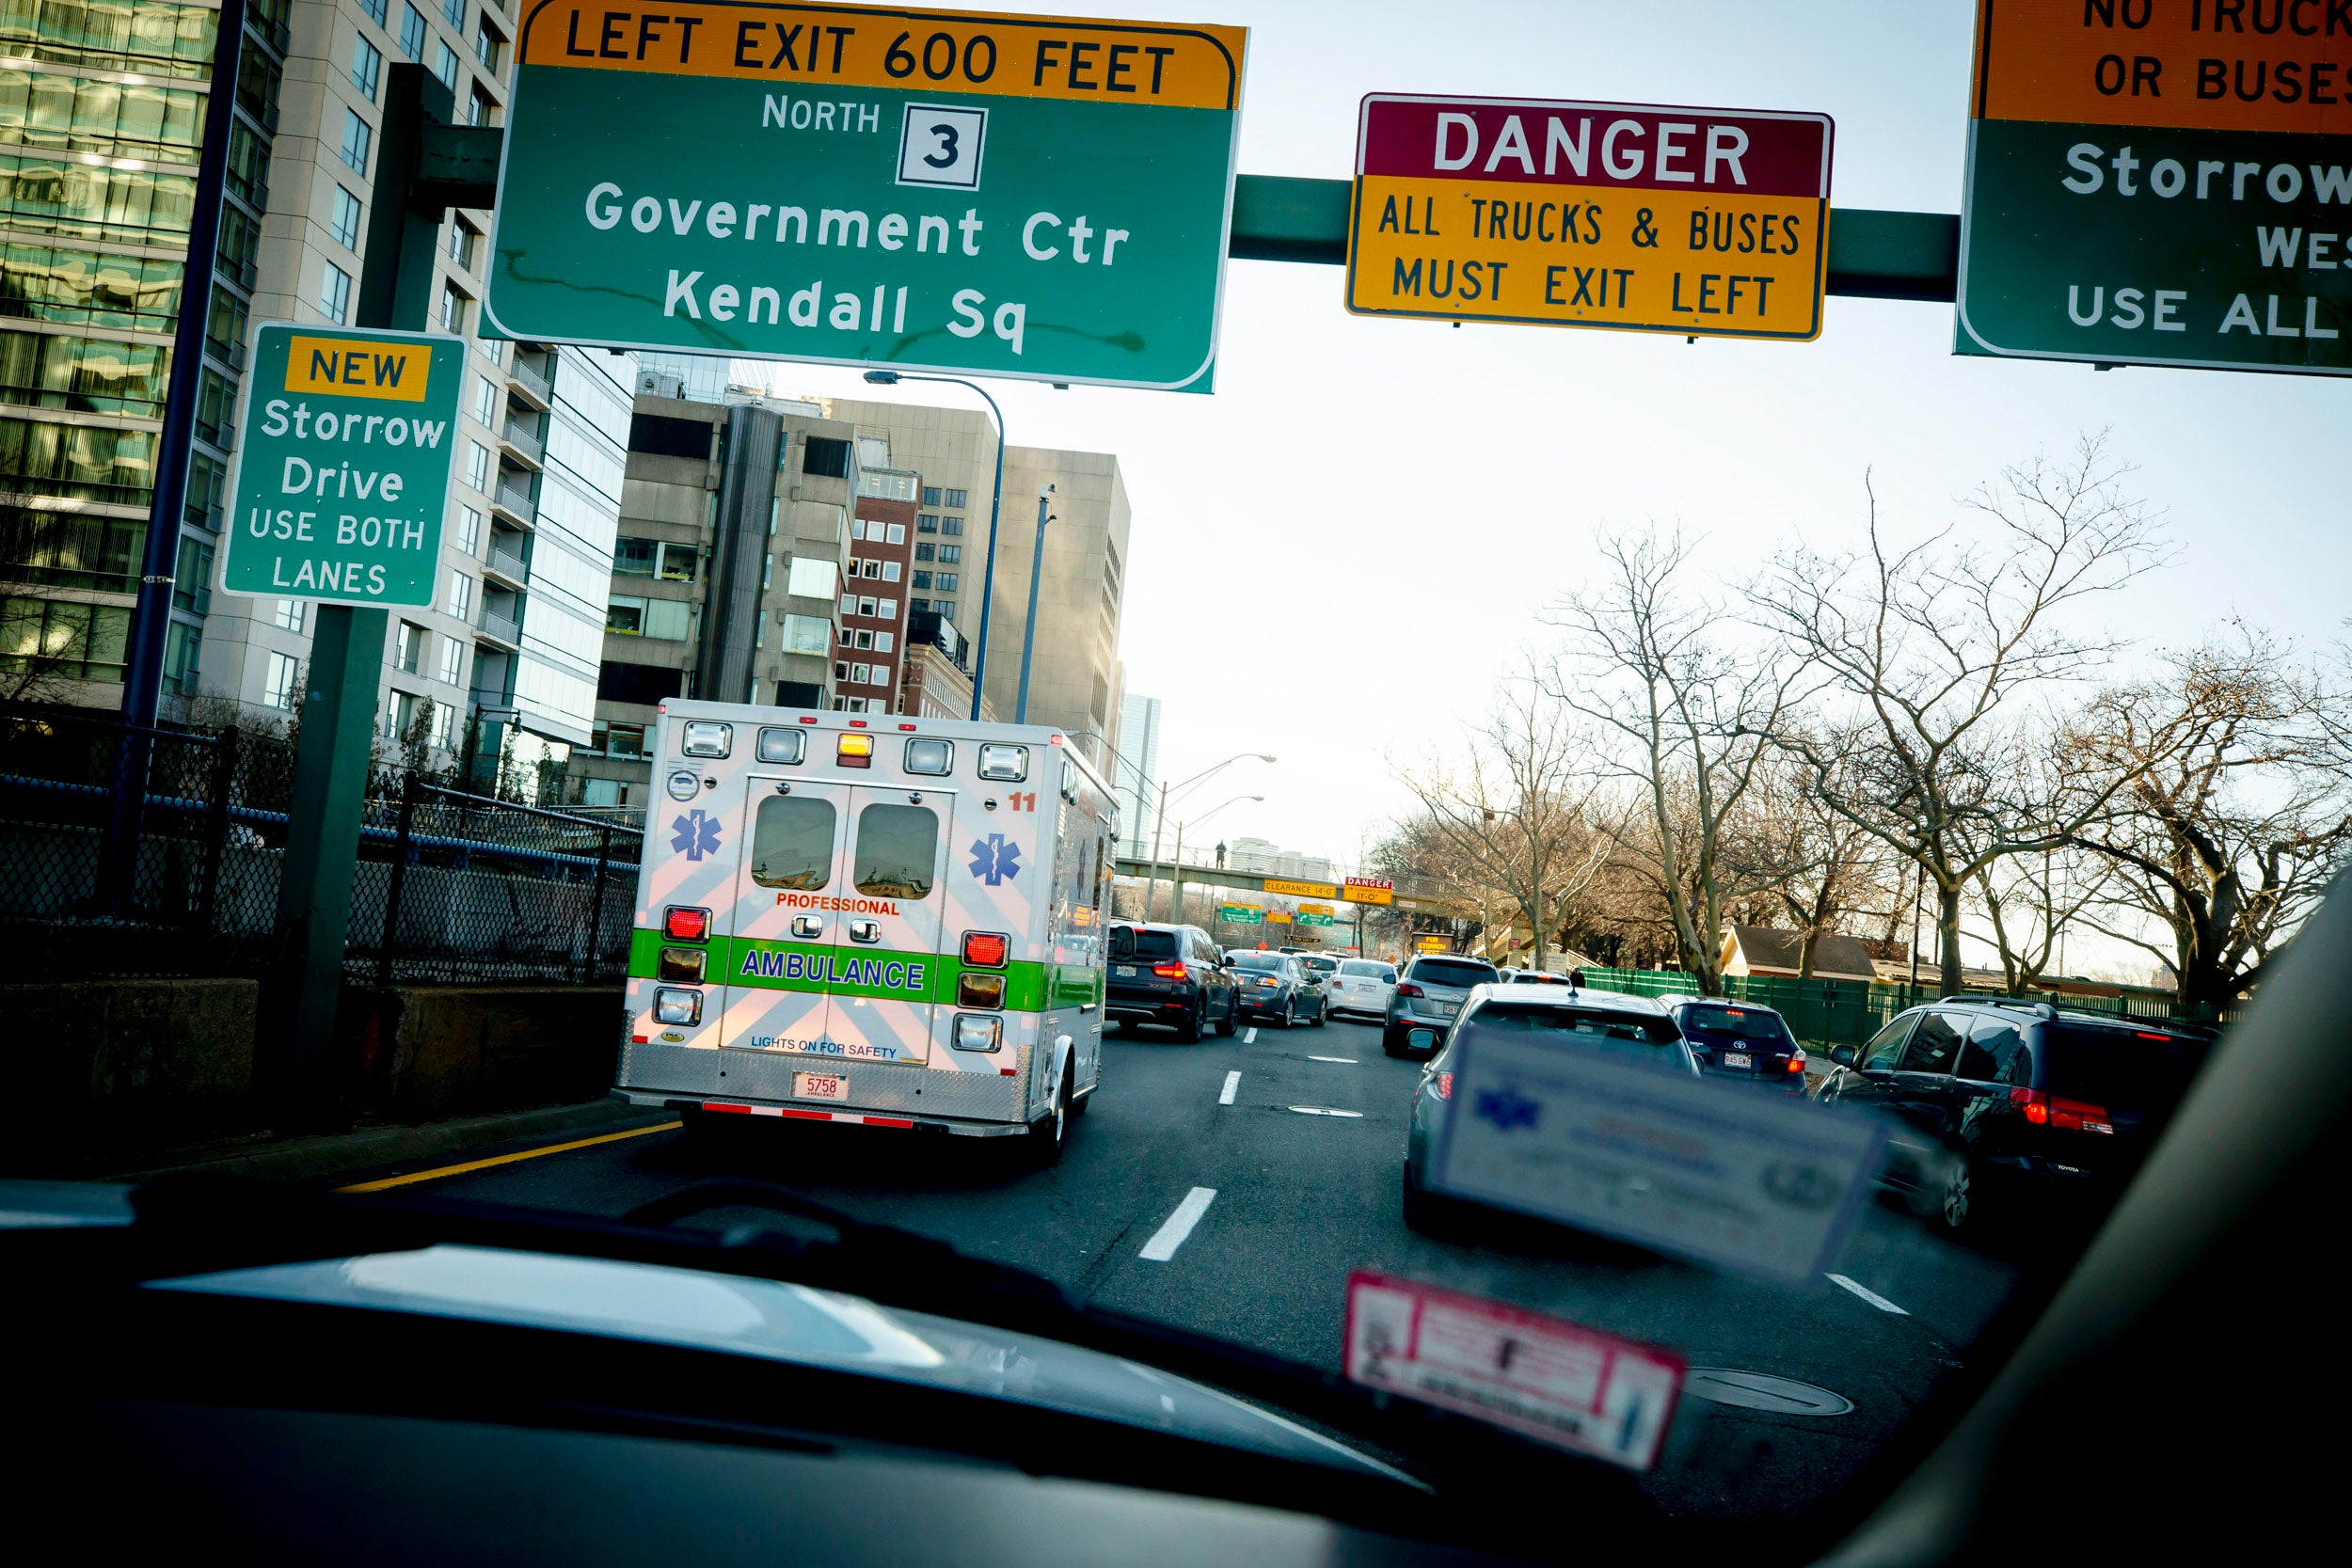 The ambulance navigates Memorial Drive traffic.